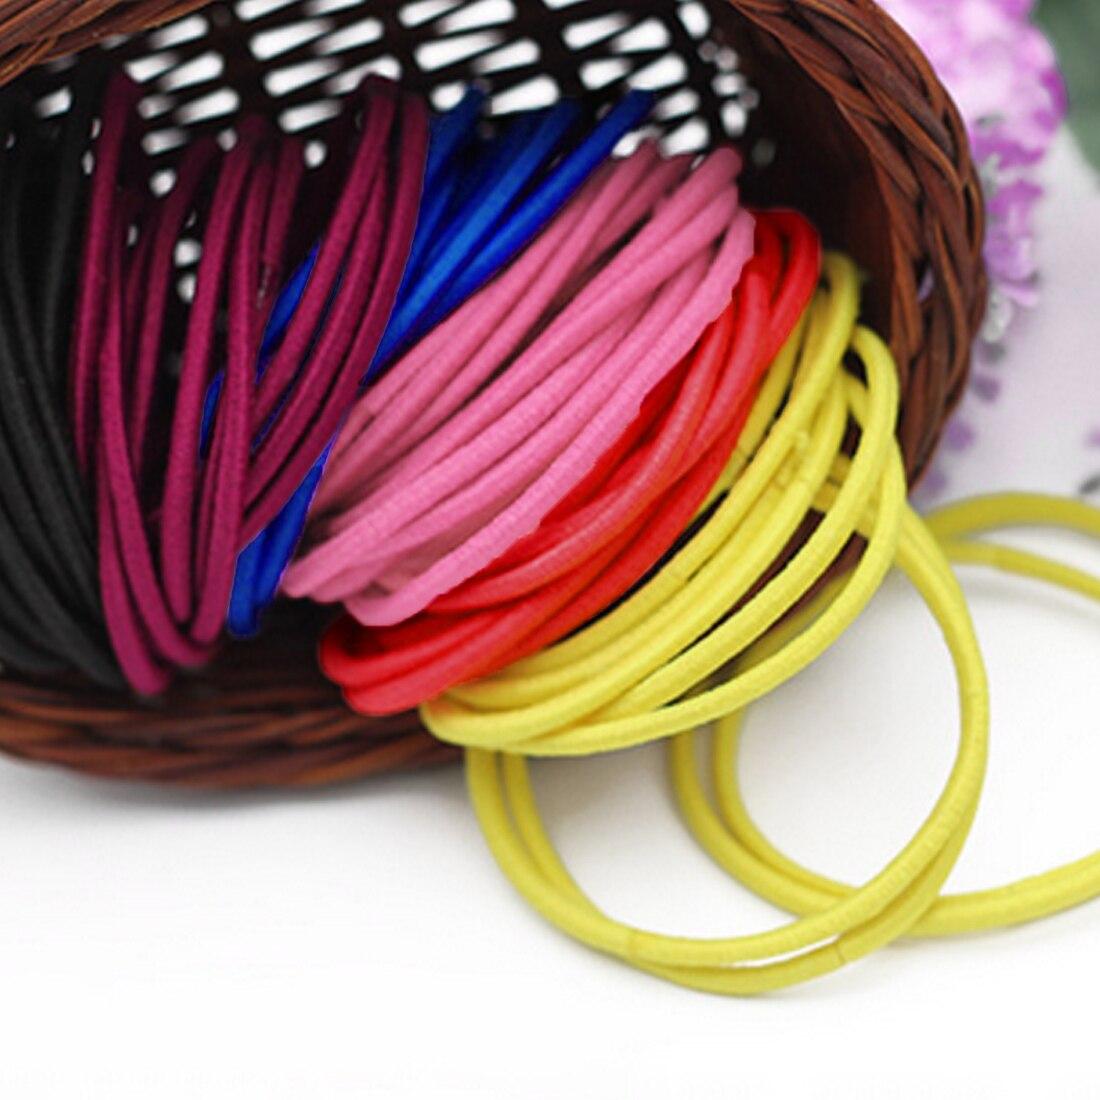 Korean 50pcs pack Women Elastic Rubberbands Hair Band Hair Ties Rings Gum Maker Scrunchy Colorful Girls Hair Accessories 2018 in Women 39 s Hair Accessories from Apparel Accessories